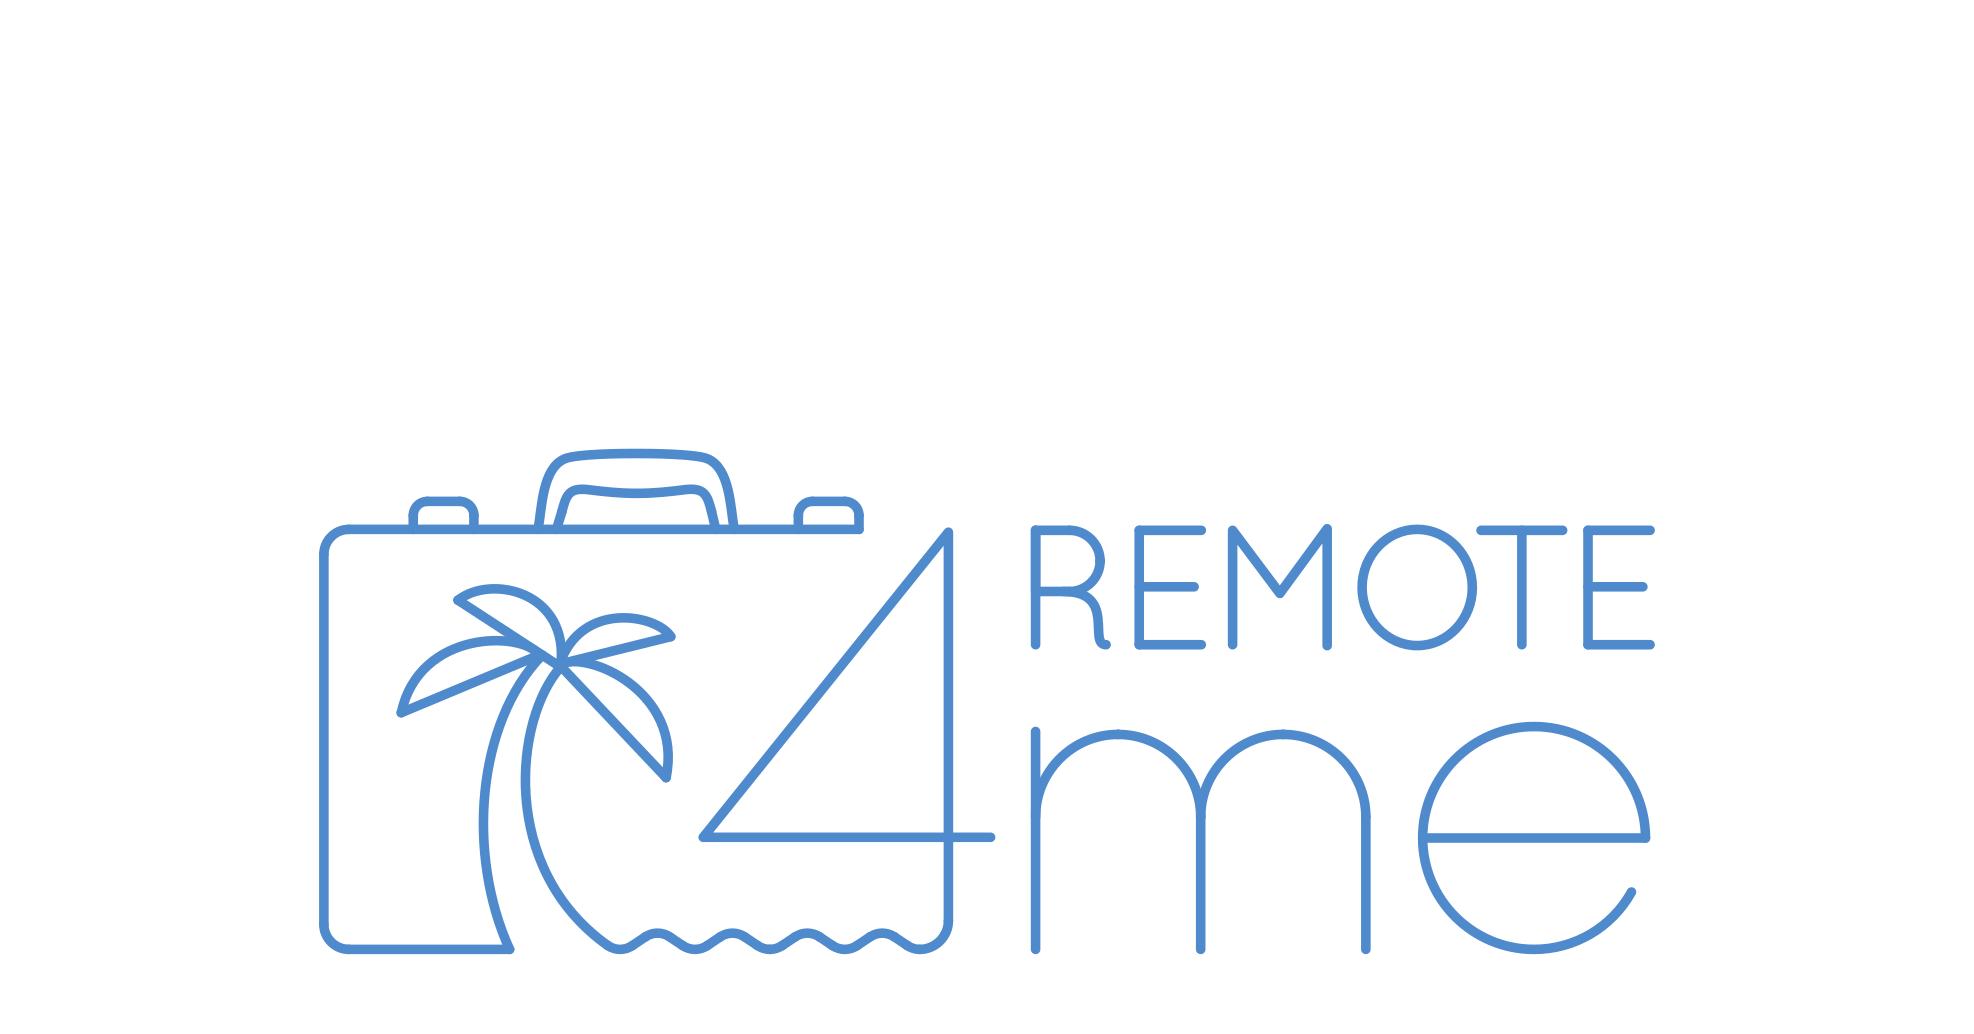 Browse 100 remote jobs by profession (Developer, Designer